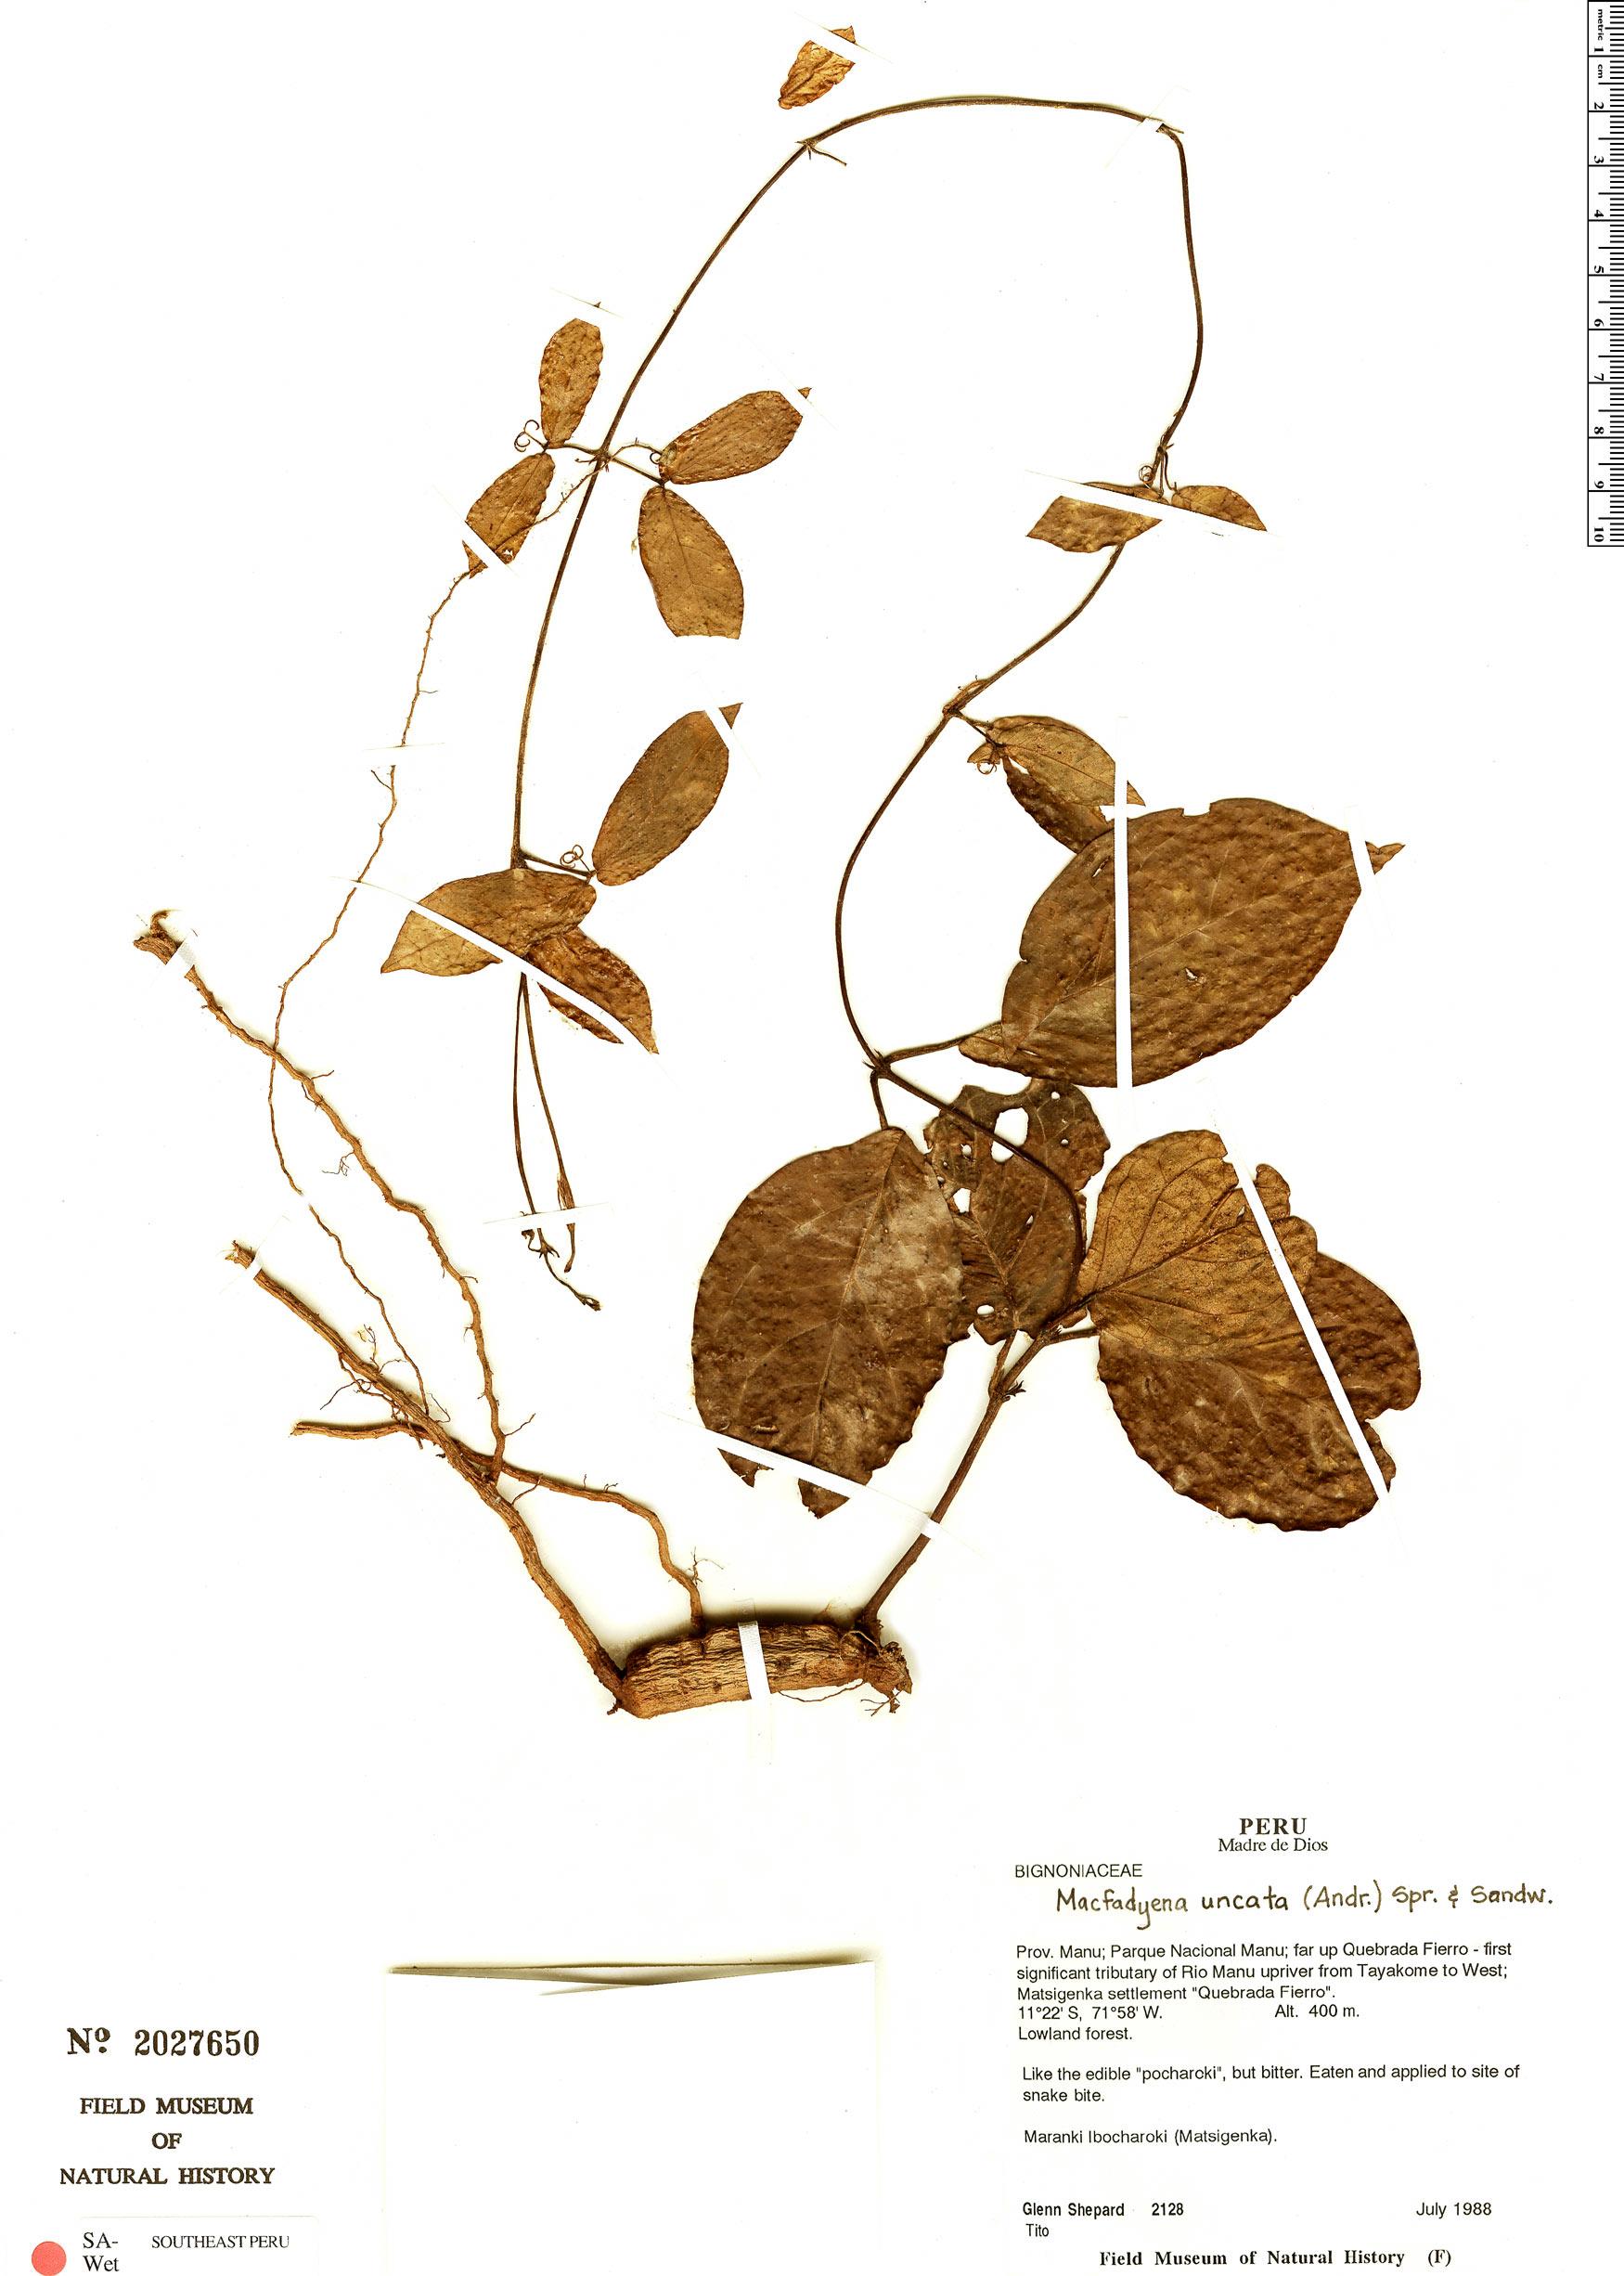 Specimen: Dolichandra uncata